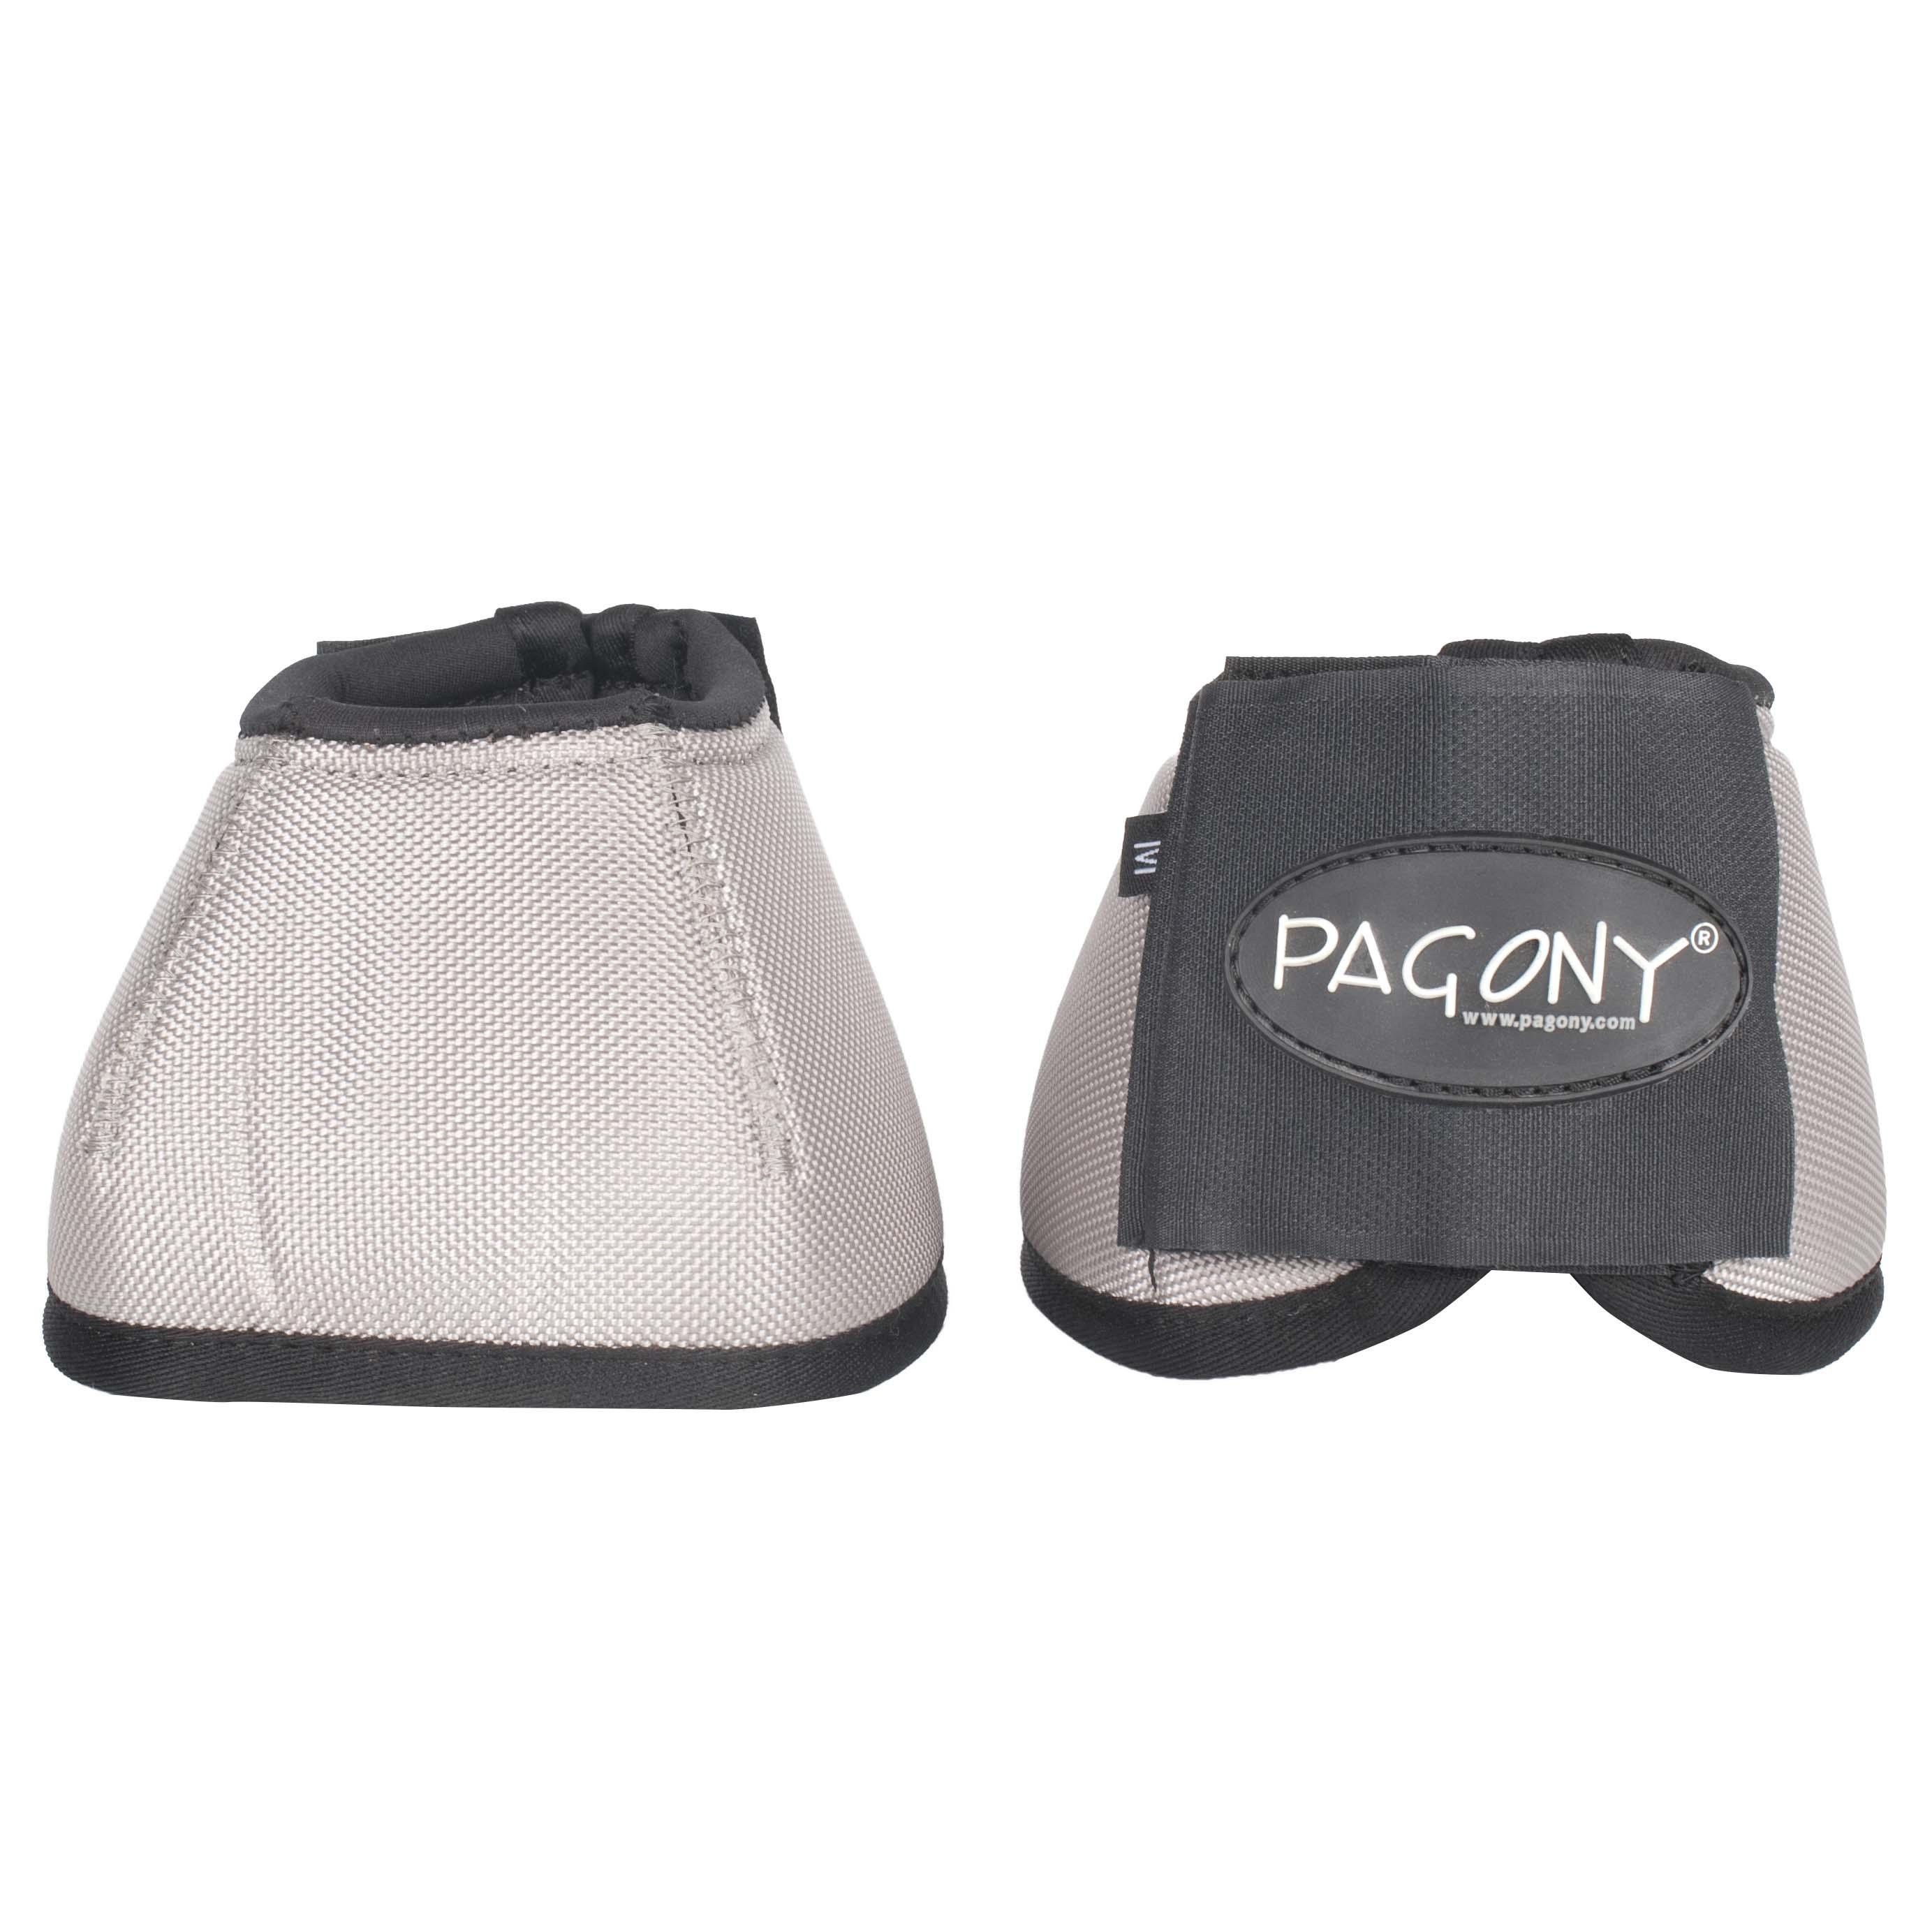 Pagony Champion springschoenen donkergrijs maat:l